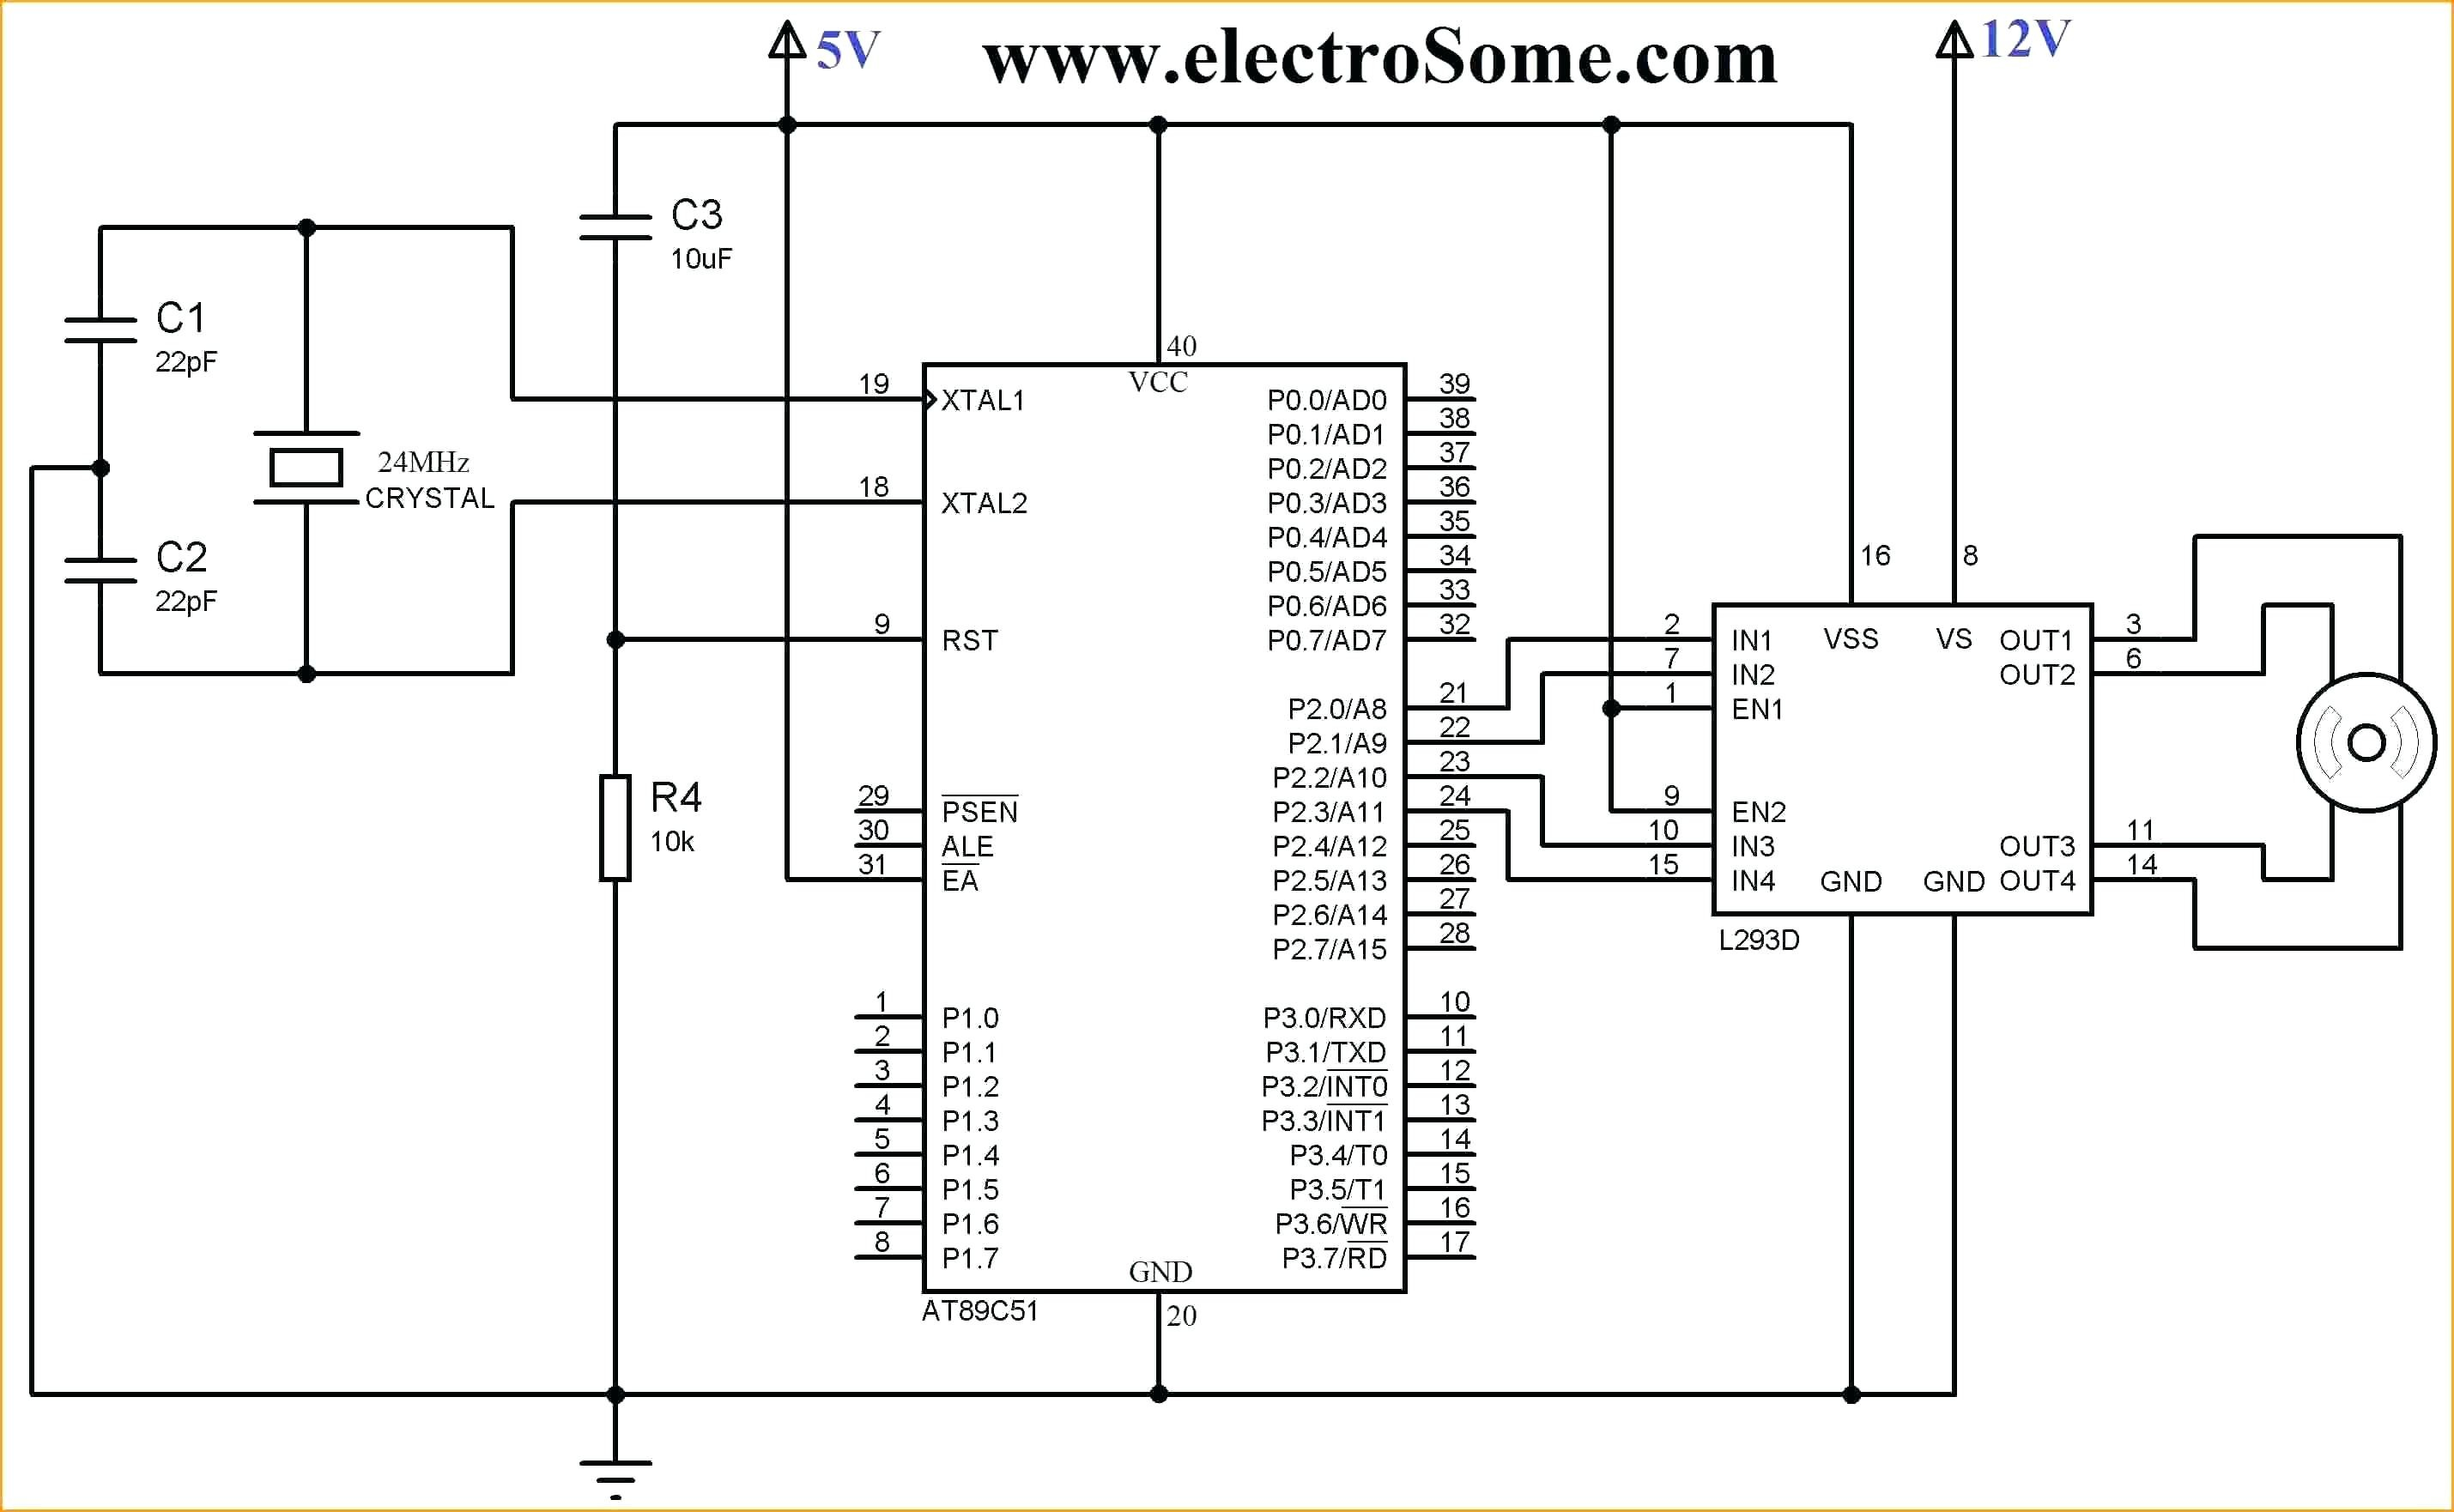 Taco Zone Valves Wiring Diagram Diagram Honeywell Zoning Wiring Inside Taco Zone Valve Of Taco Zone Valves Wiring Diagram